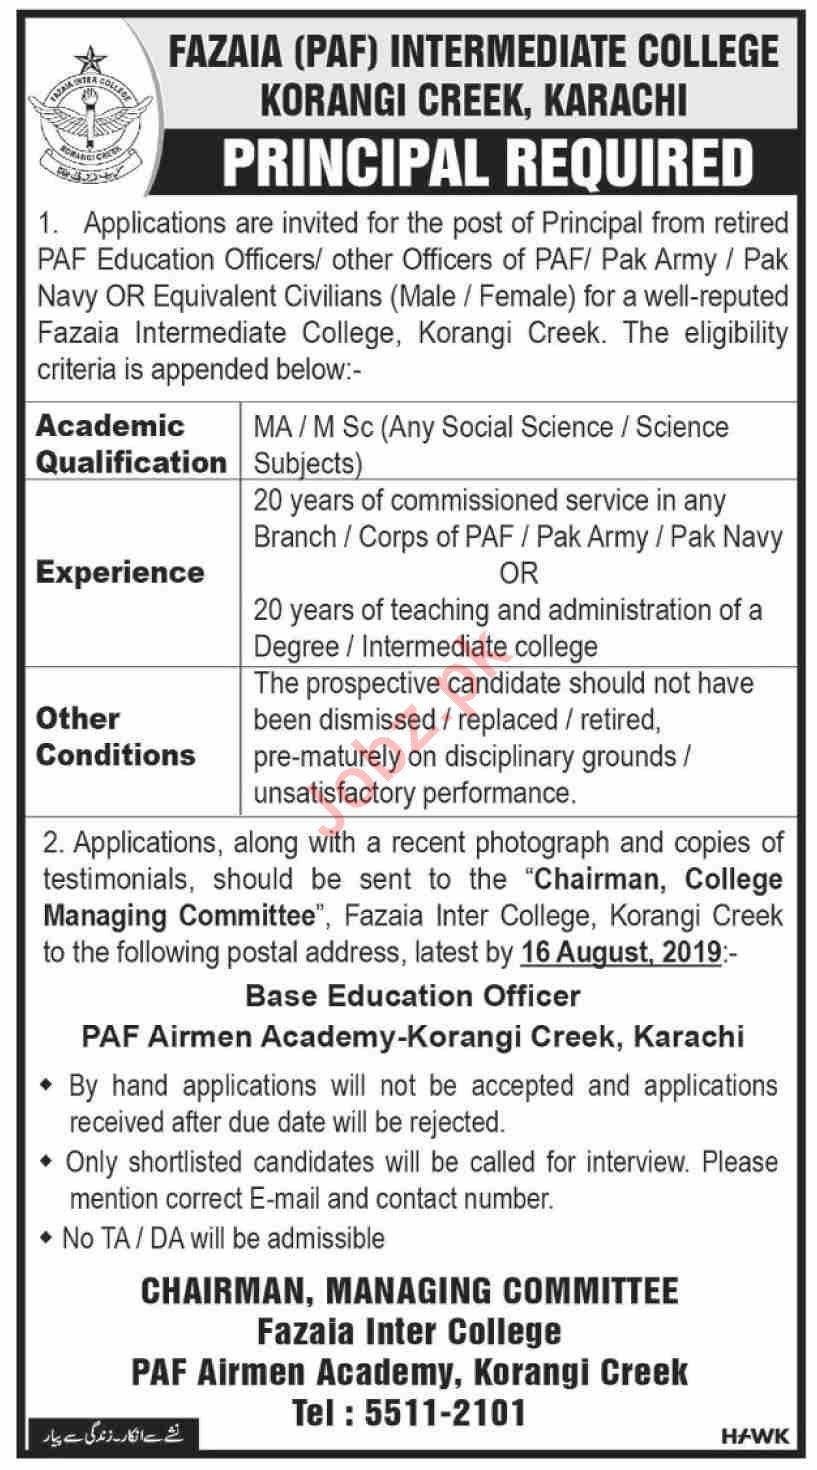 Fazaia Inter College PAF Karachi Jobs 2019